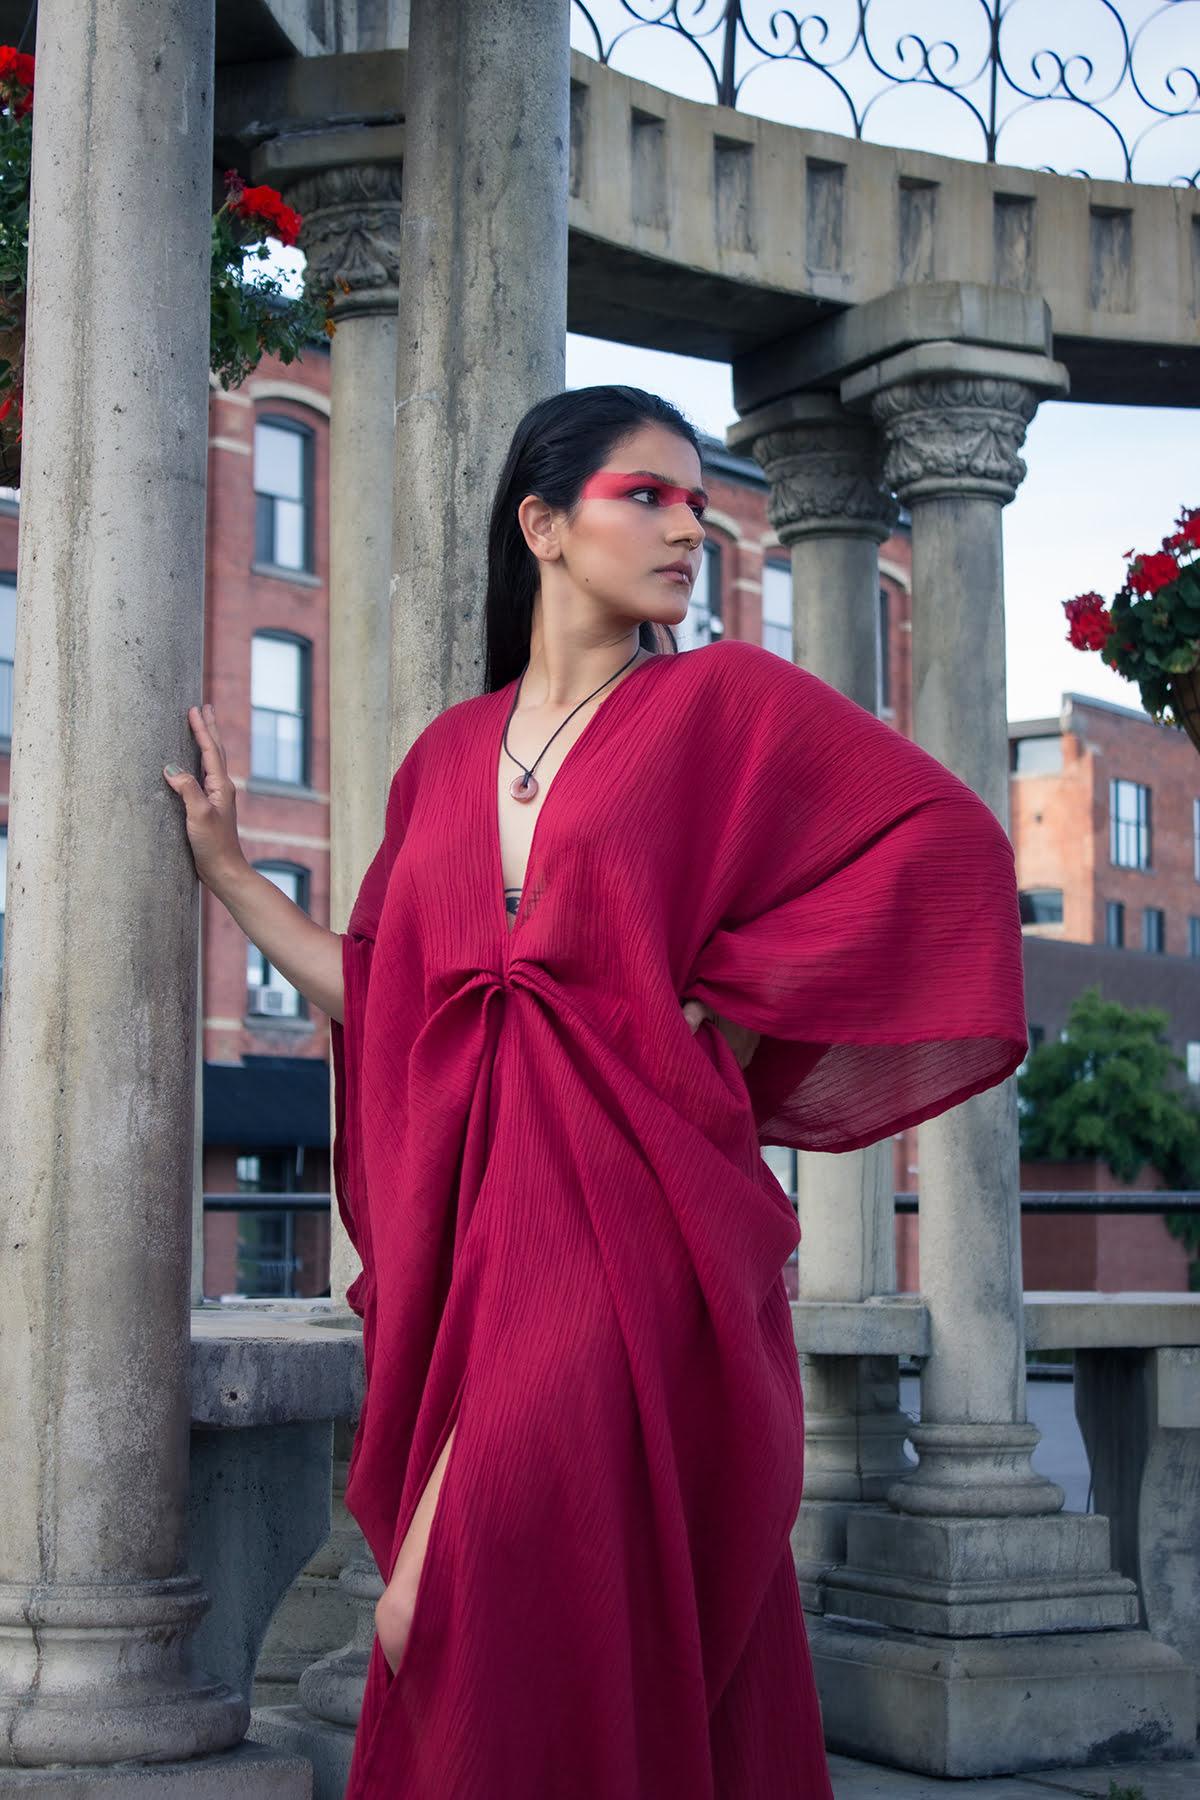 Woman wearing red organic cotton goddess red dress